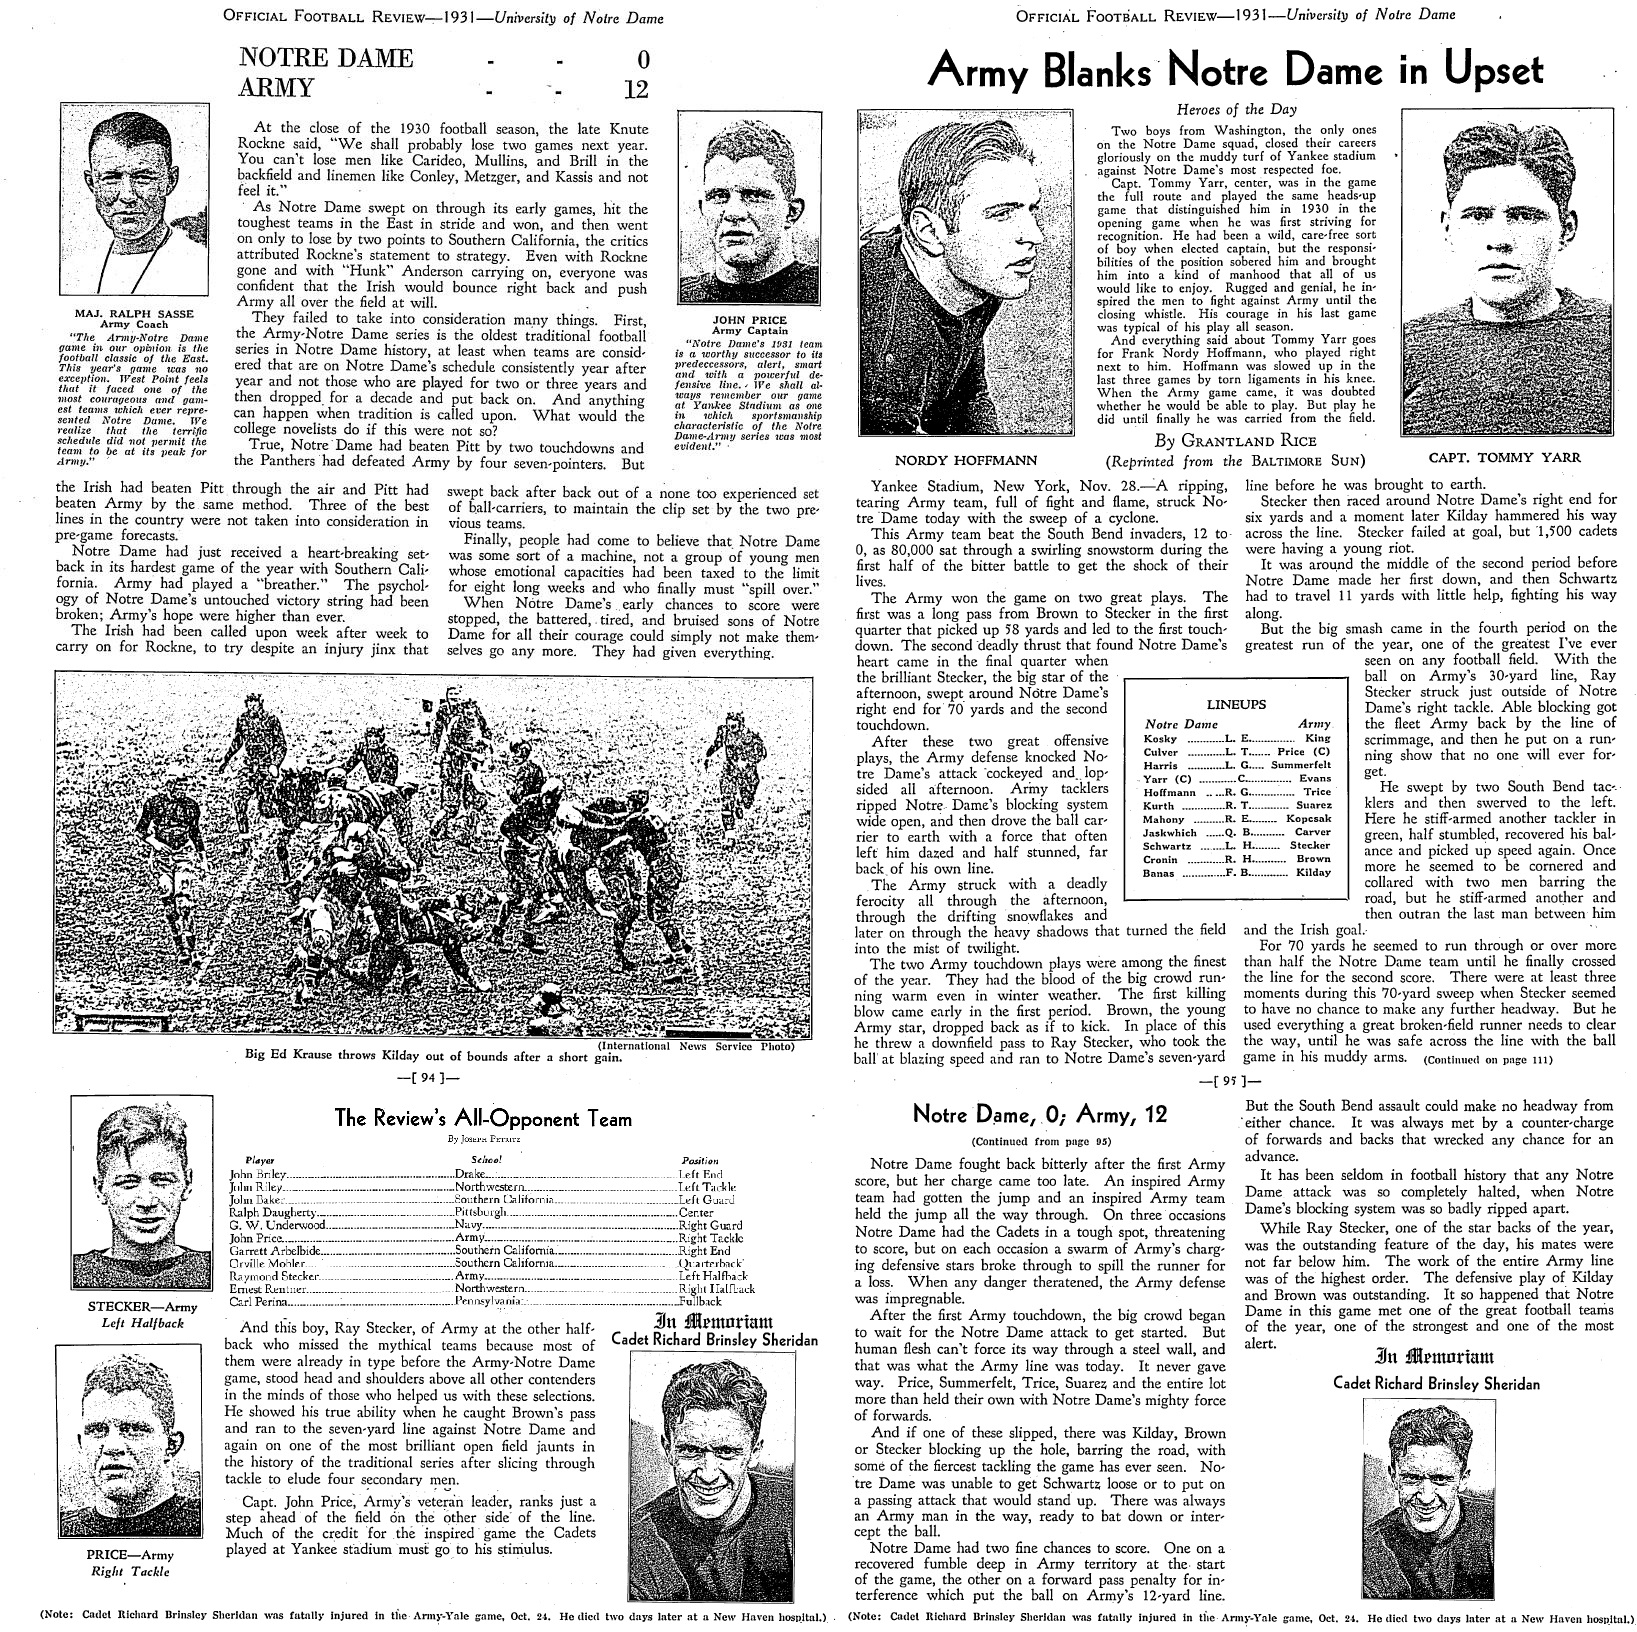 armyfb_1931_notredameofficialfootballreview